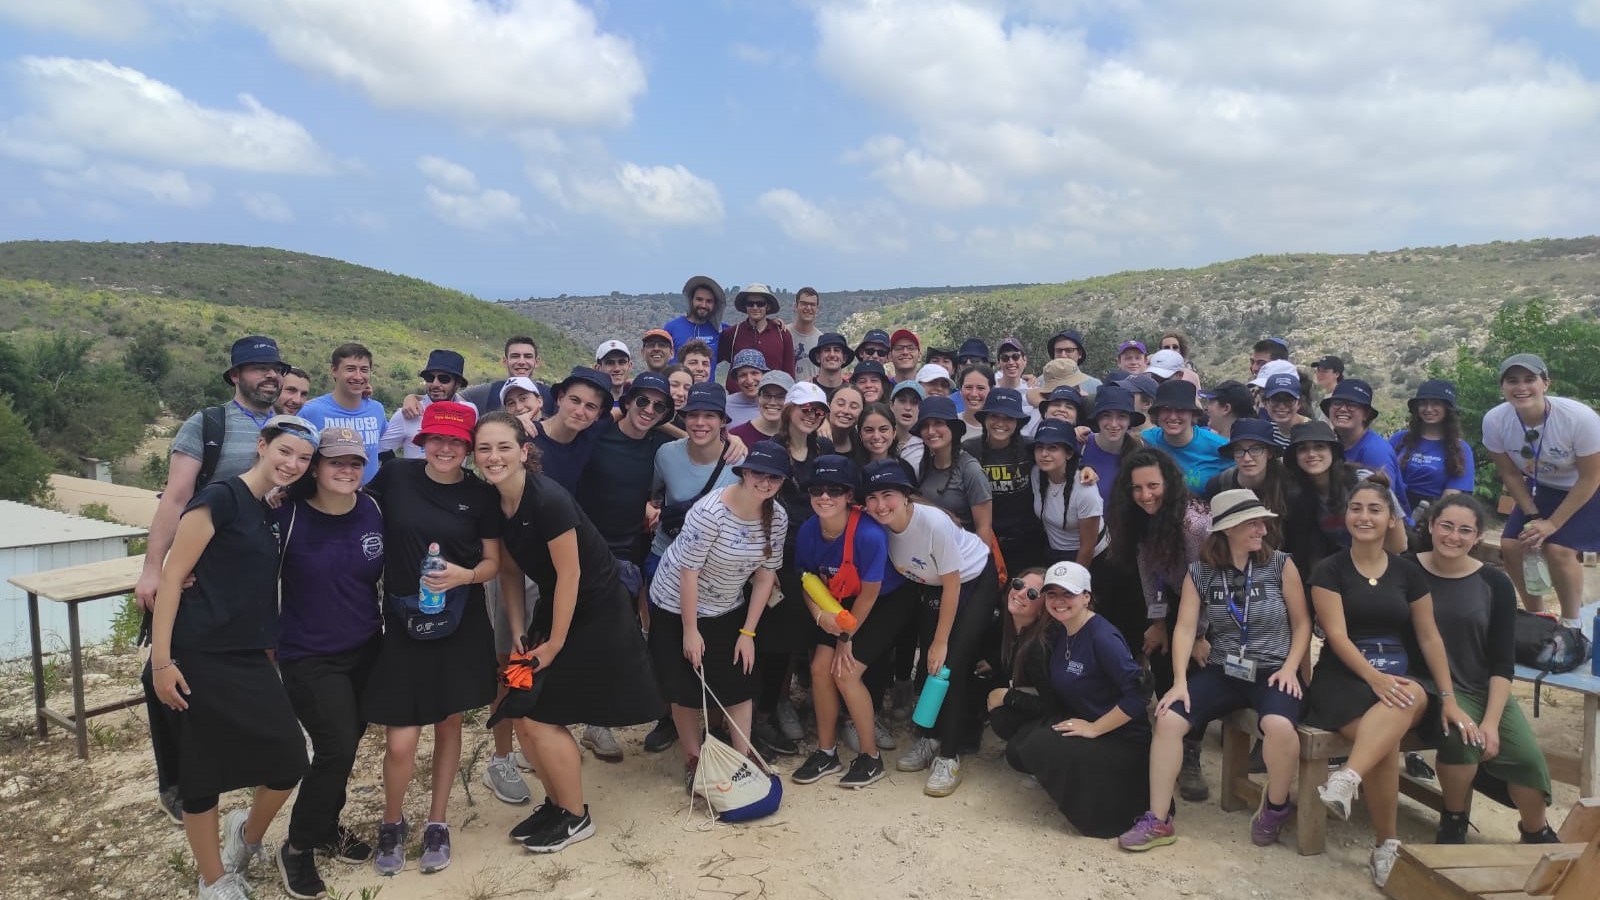 JNF-USA Alternative Break participants in Israel 2